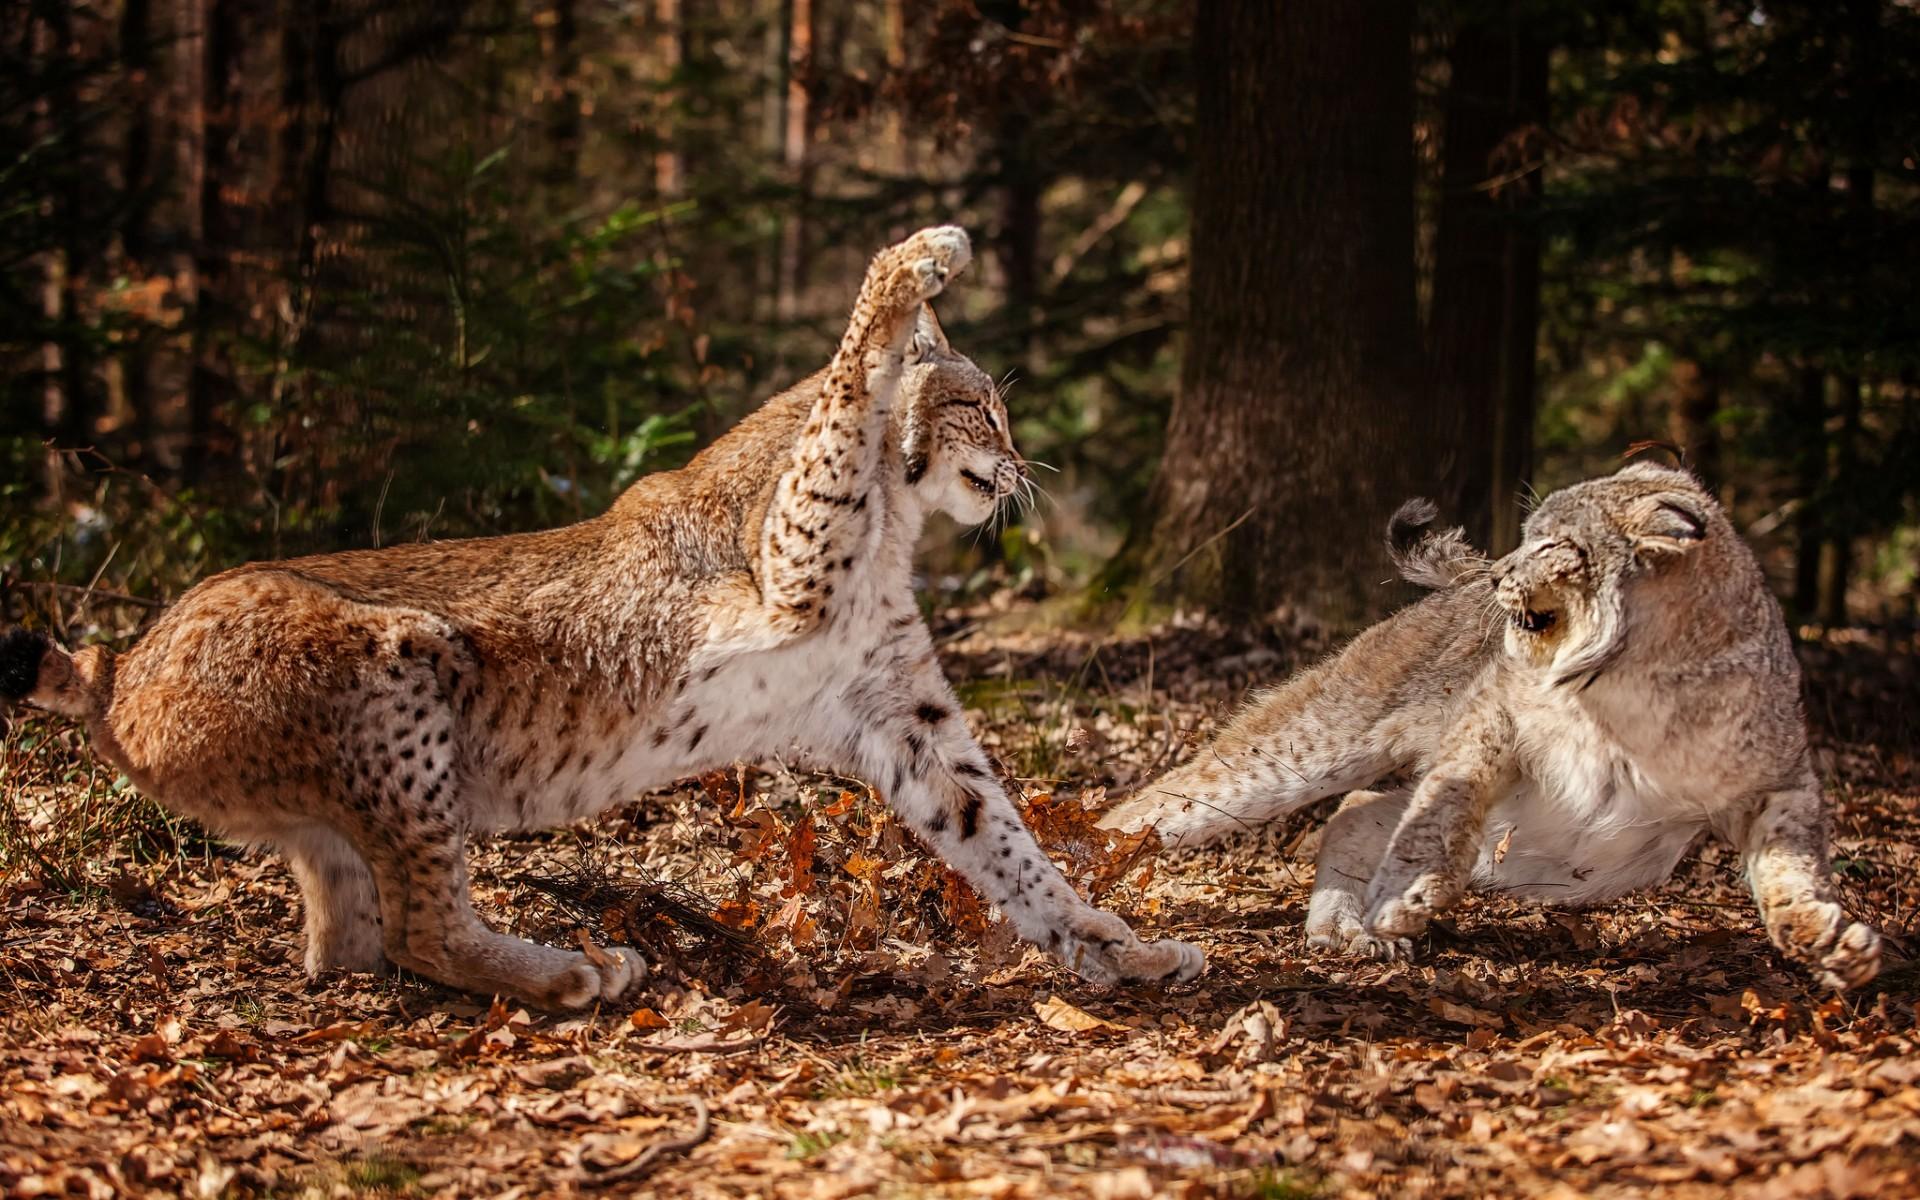 lynx forest jungle animal - photo #32